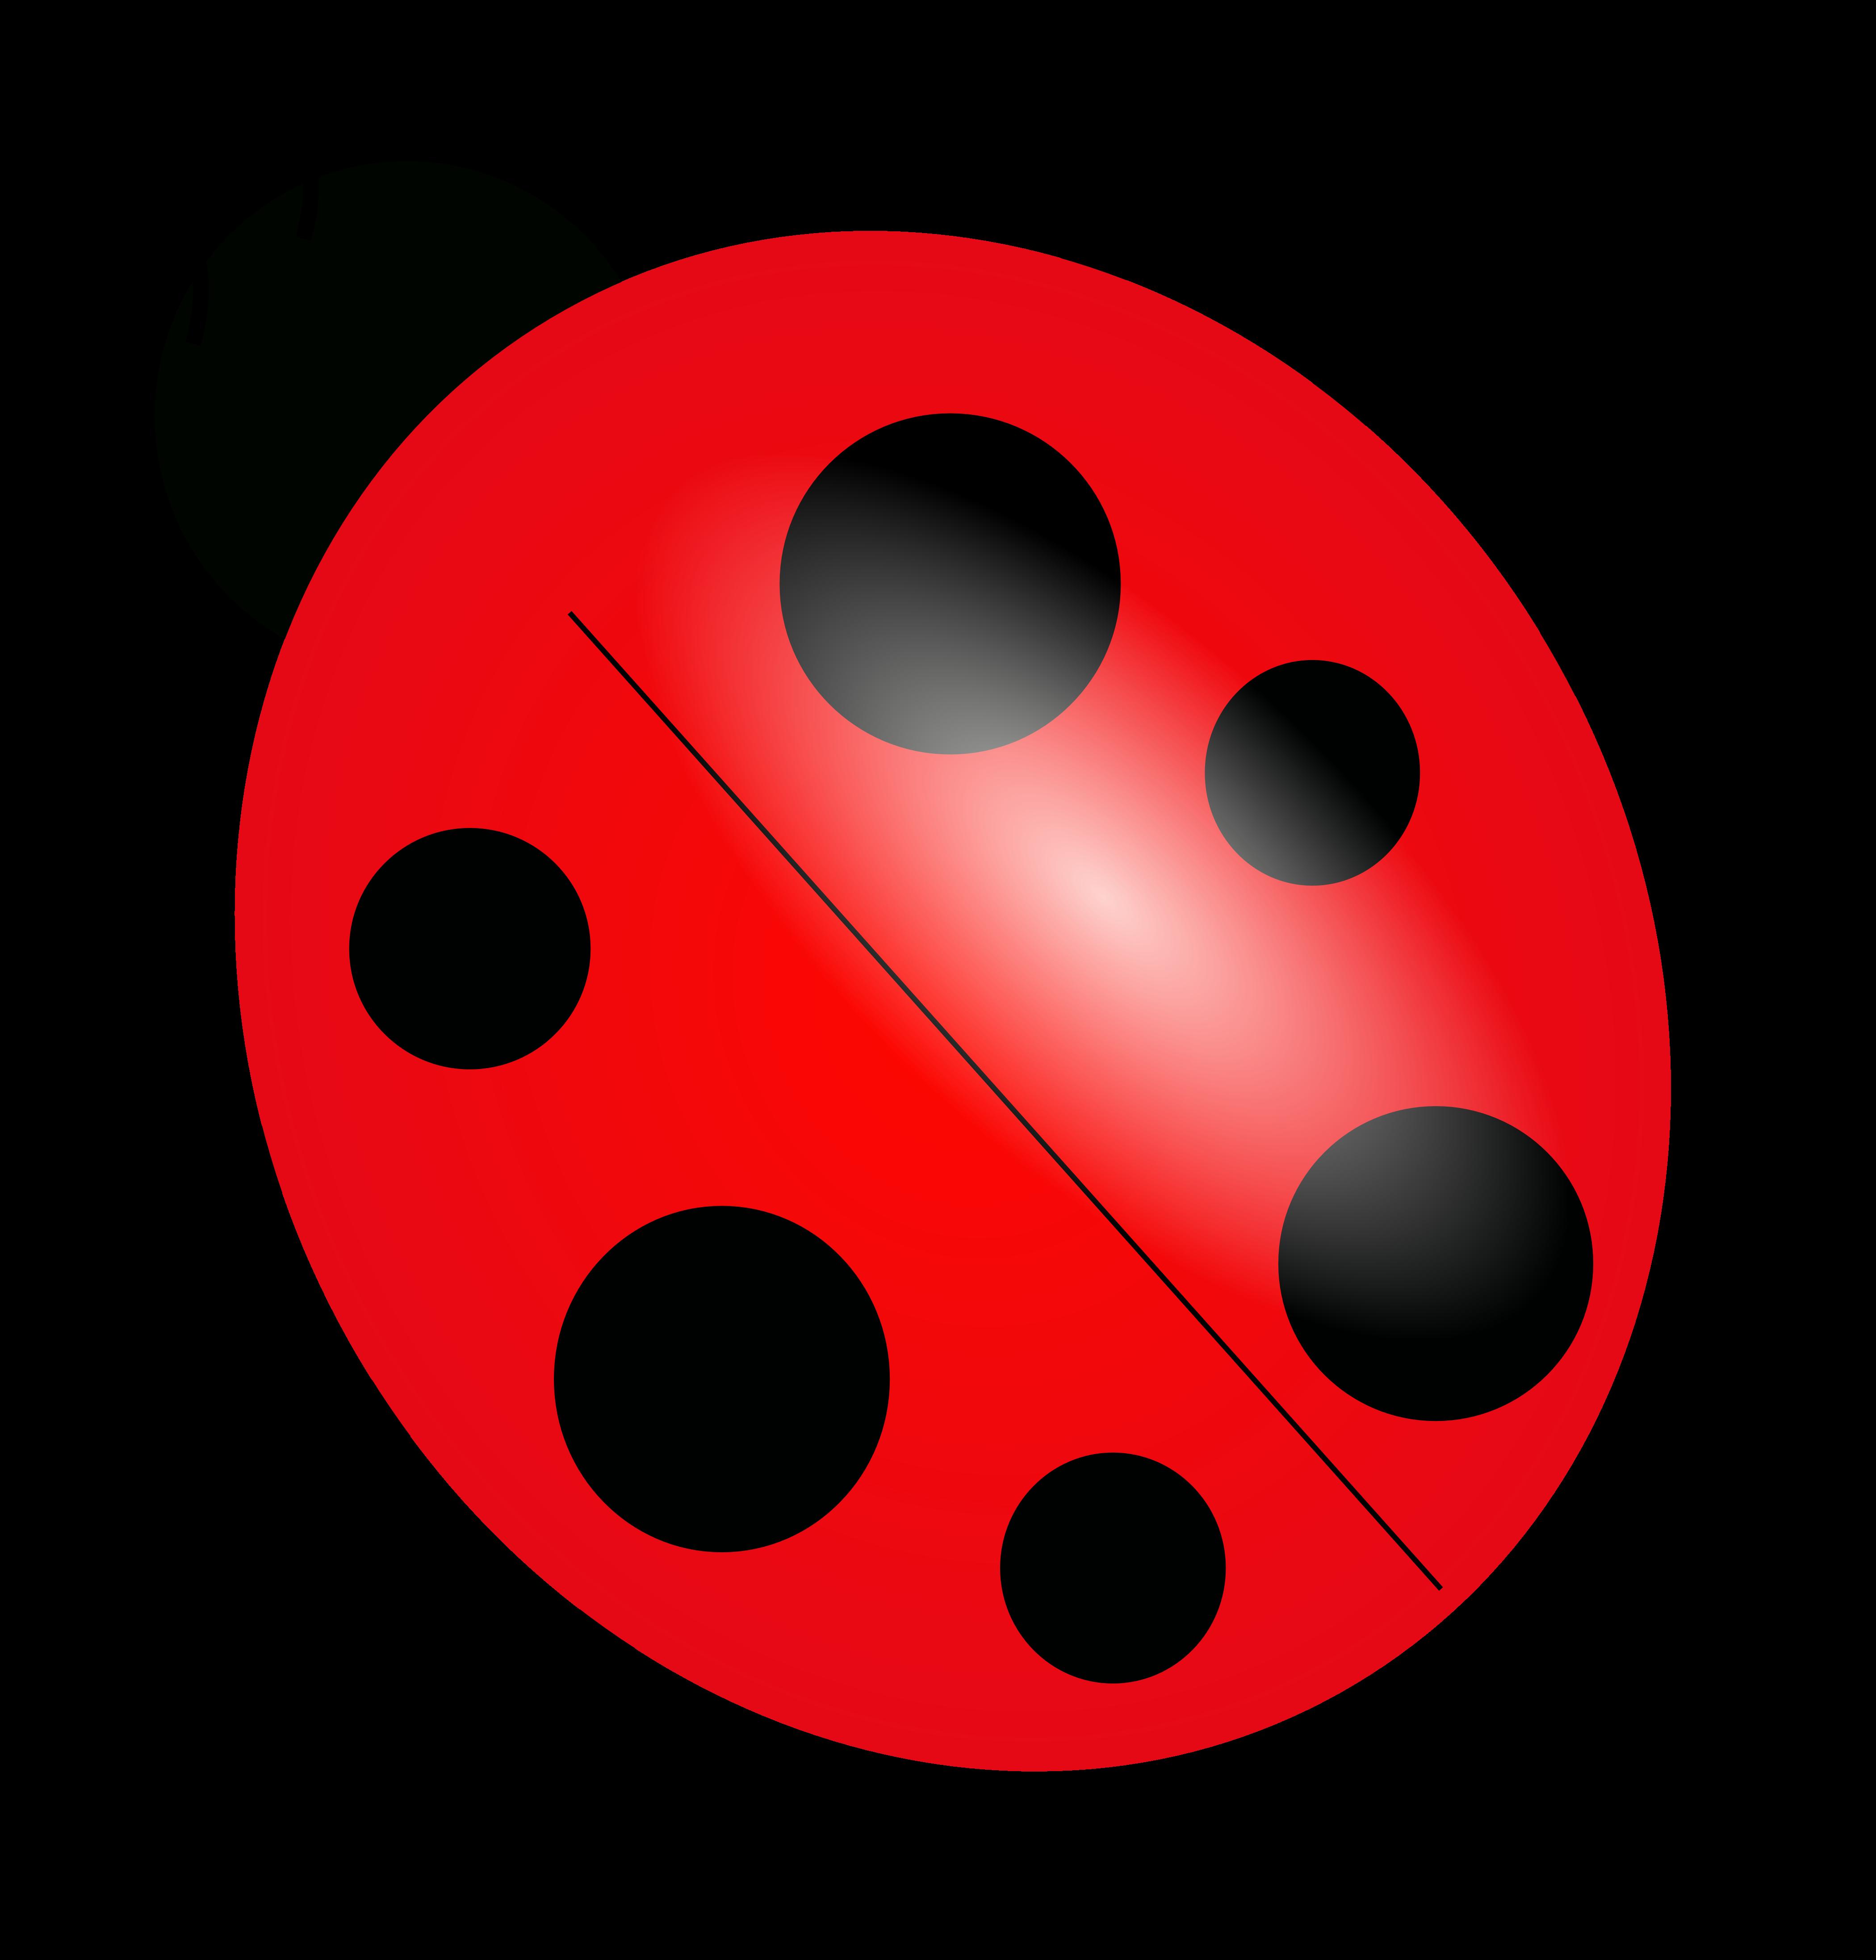 jpg library download Rinr yabt png ladybug. Ladybugs clipart let's celebrate.